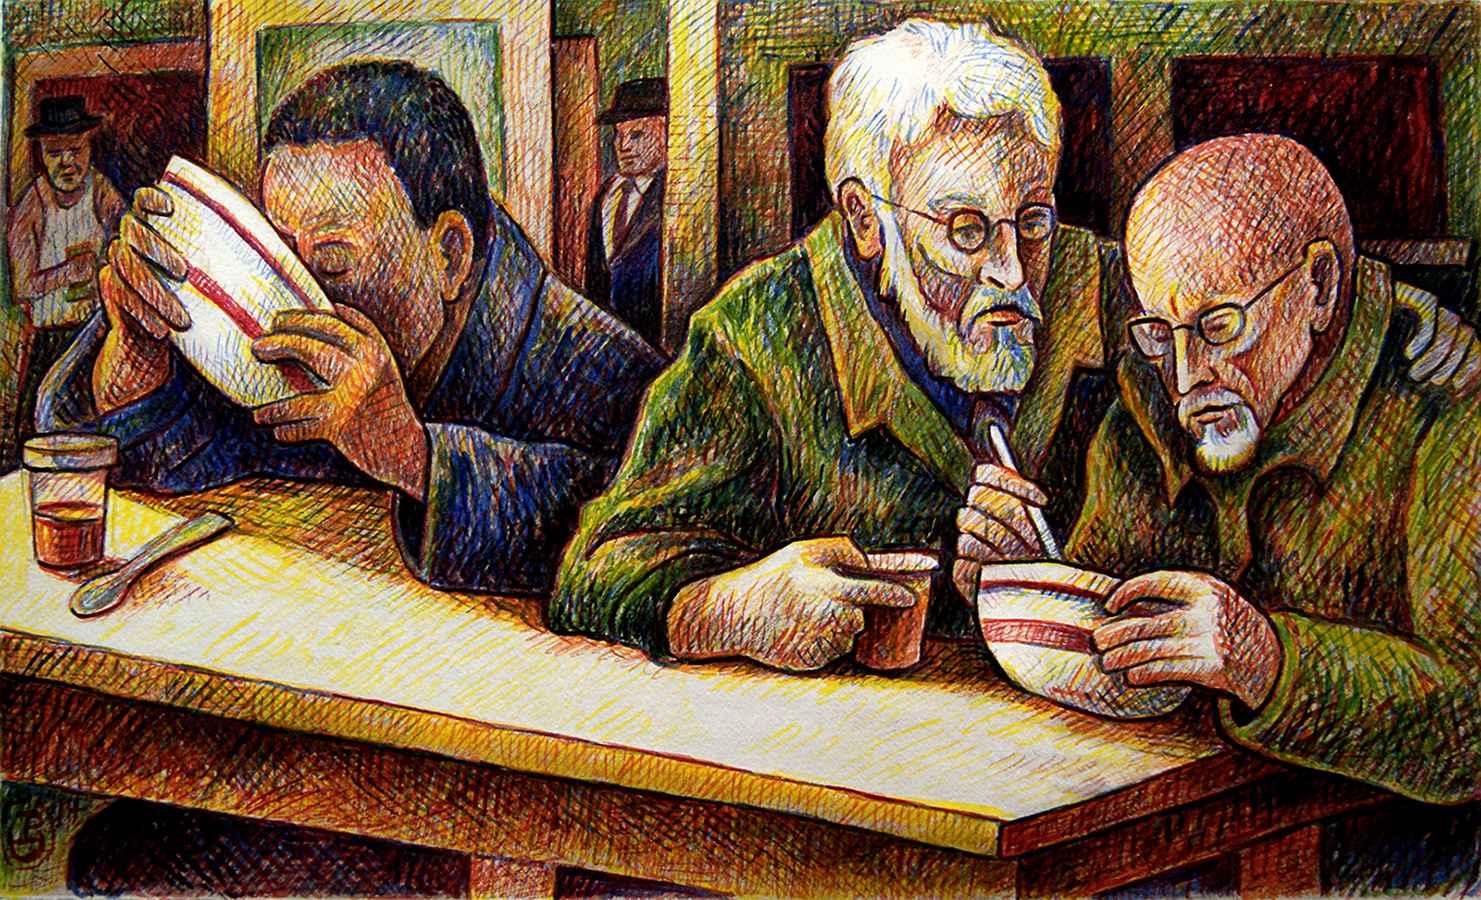 Soup Kitchen by  Patrick Doughman - Masterpiece Online